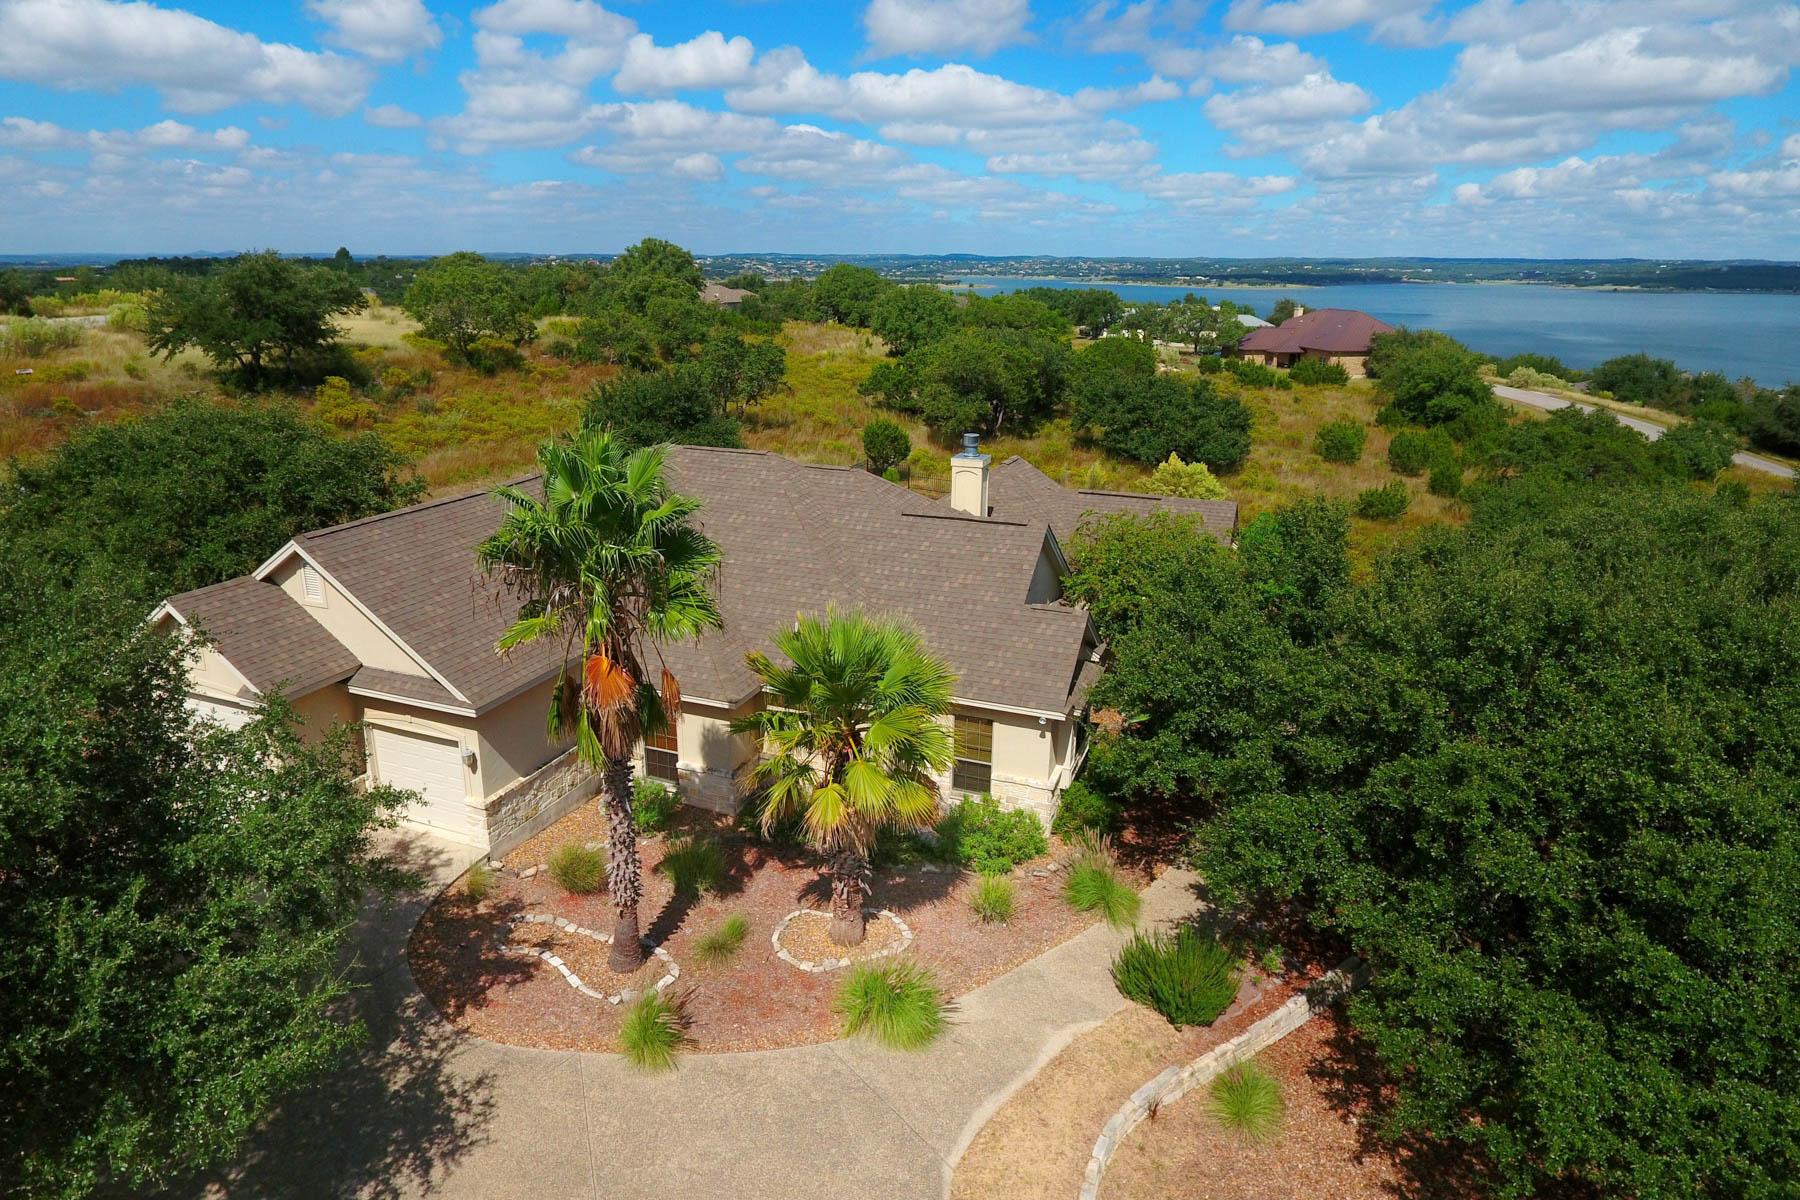 Casa Unifamiliar por un Venta en Lake Views in Oak Shores Estates 195 Scarlet Ct Canyon Lake, Texas 78133 Estados Unidos